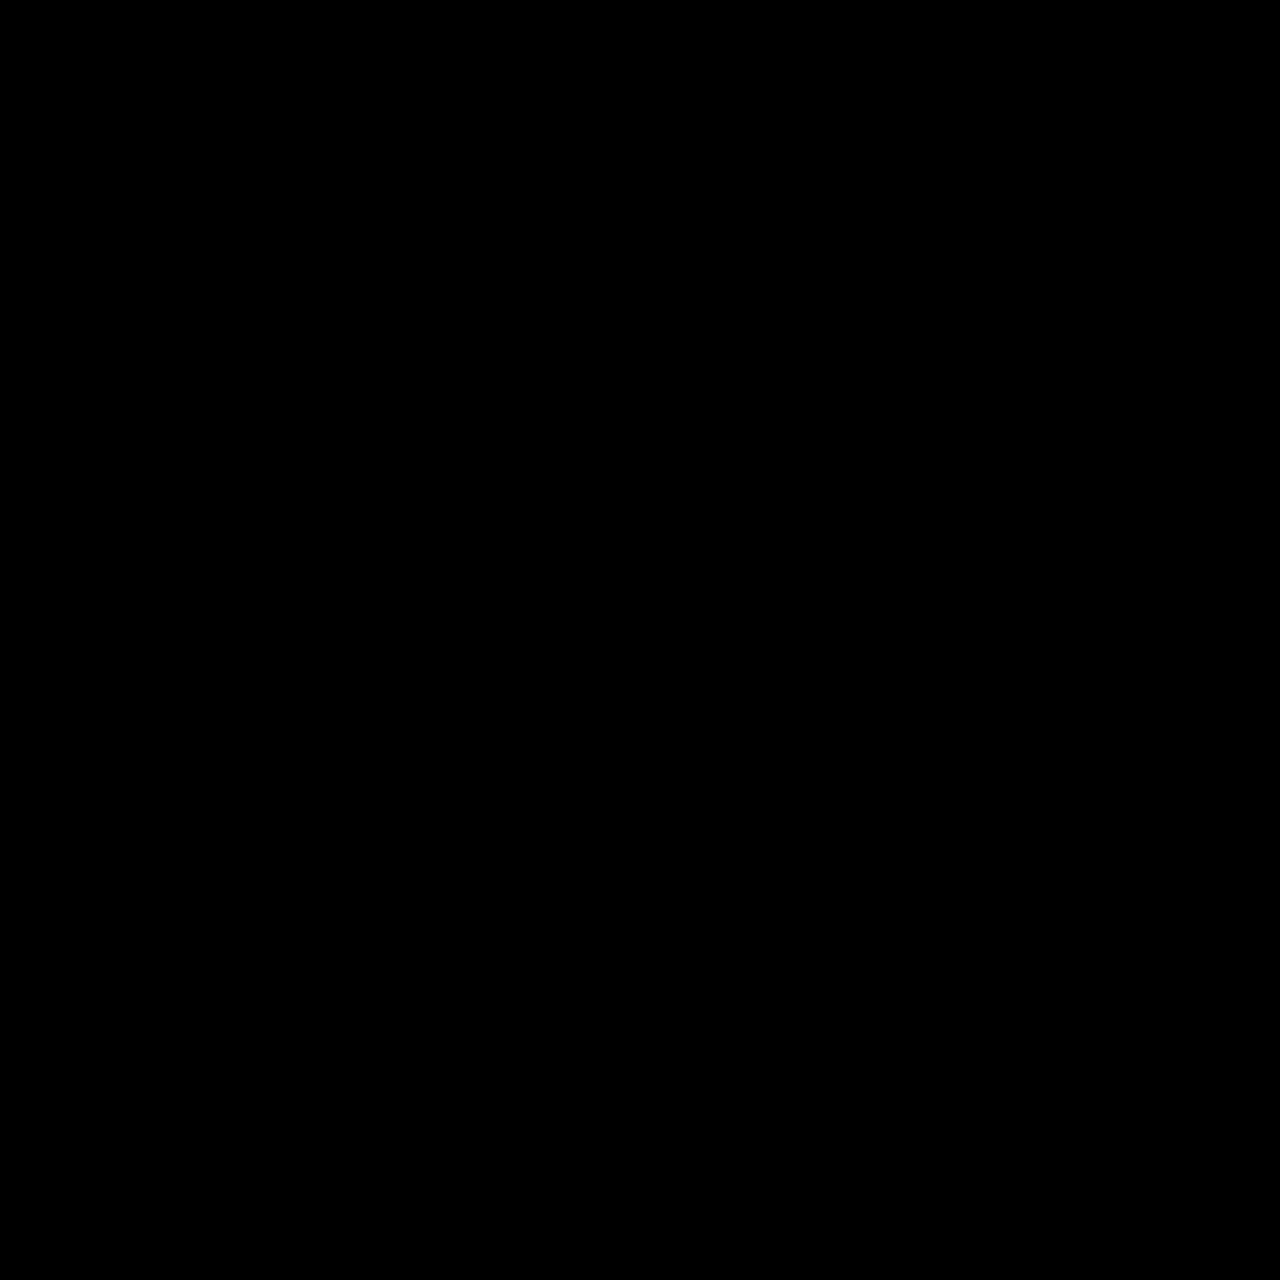 speed-black-50x50